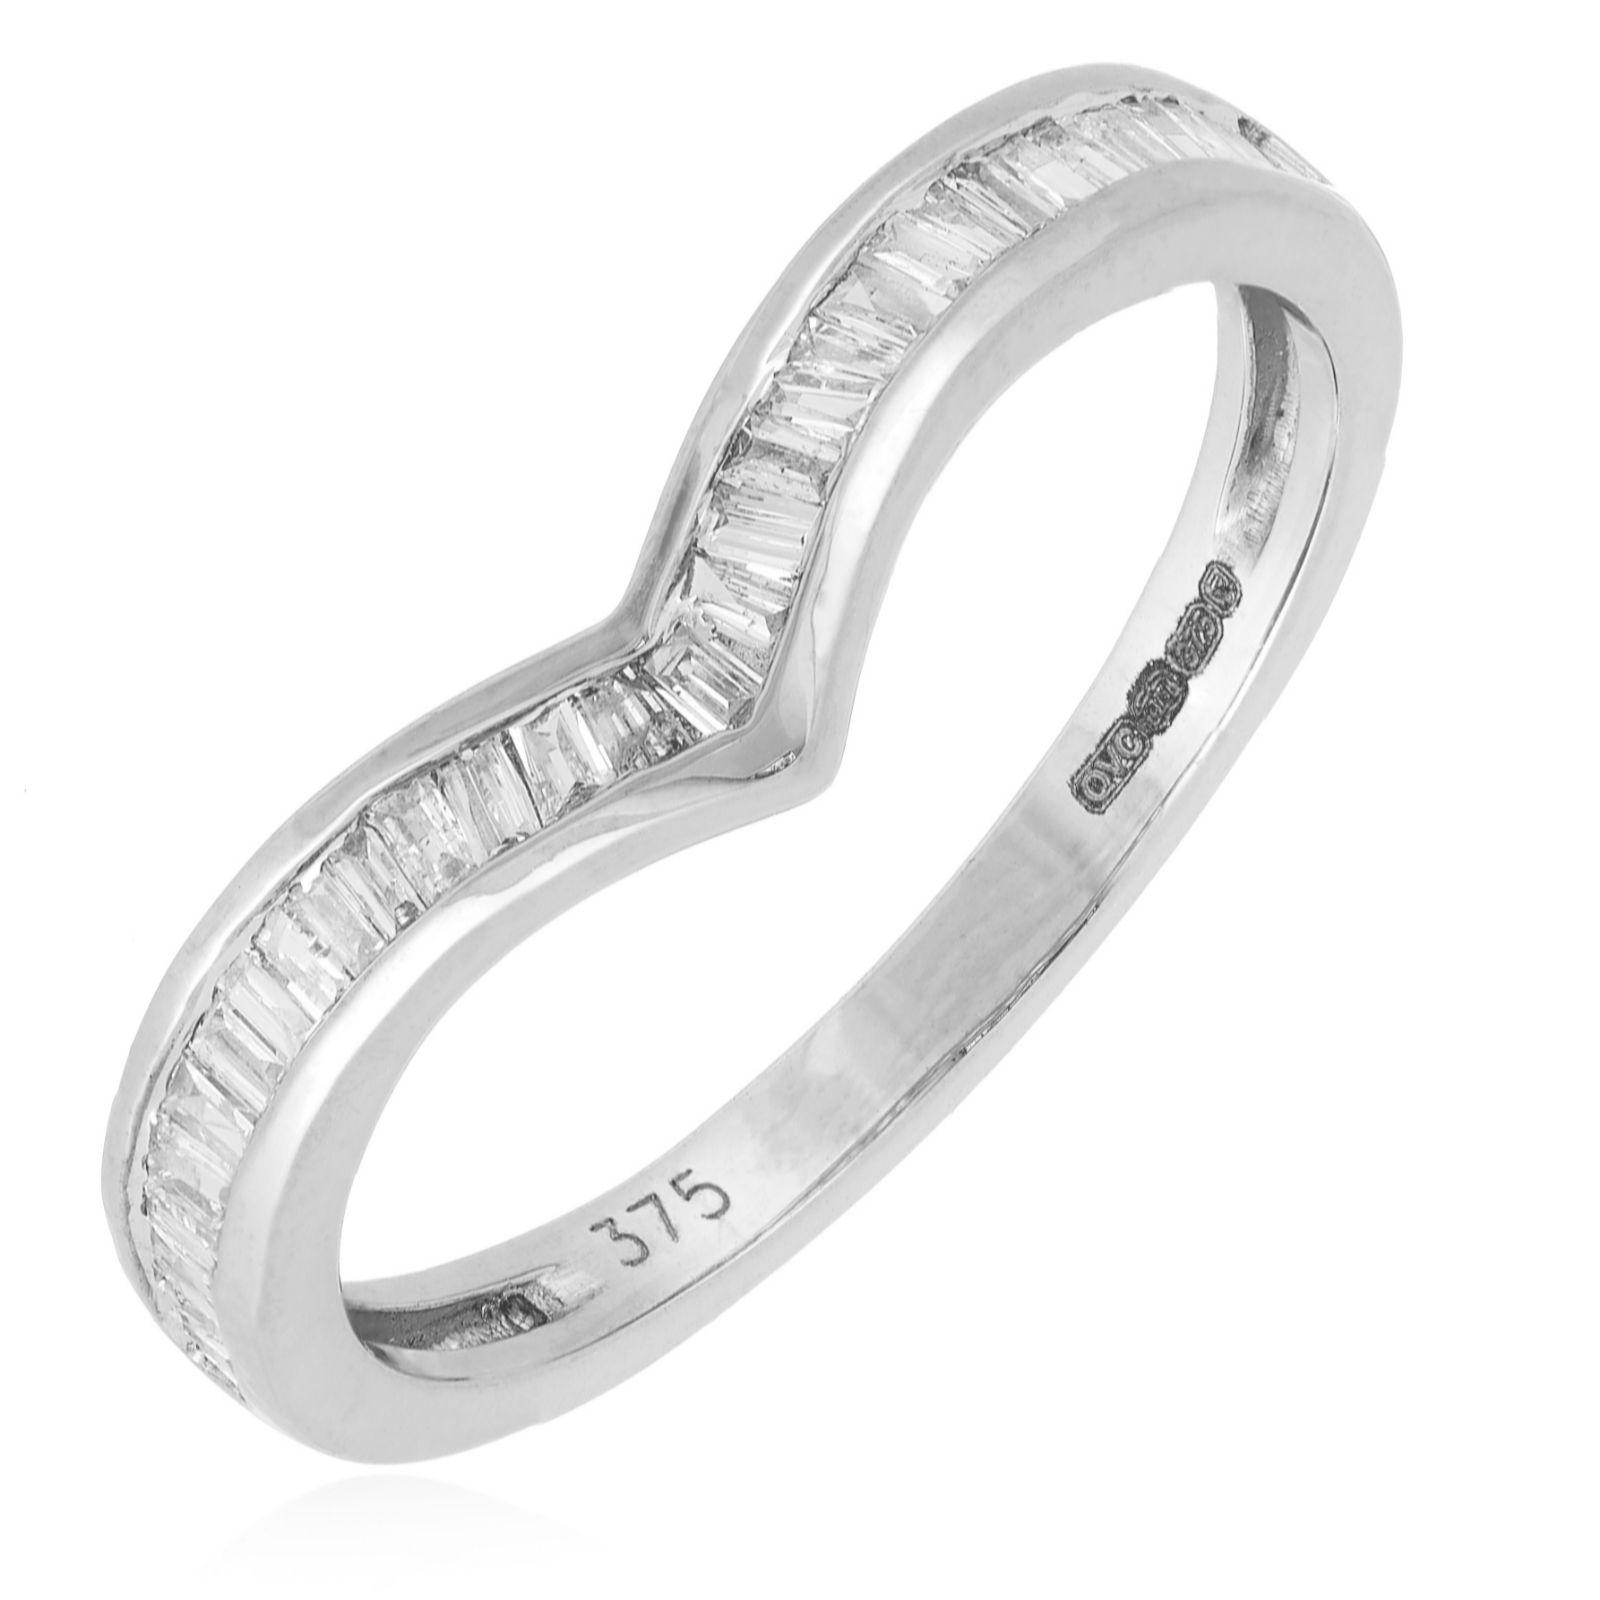 9b8d63bfe5b95f 0.20ct Diamond Baguette Cut Wishbone Ring 9ct Gold - QVC UK